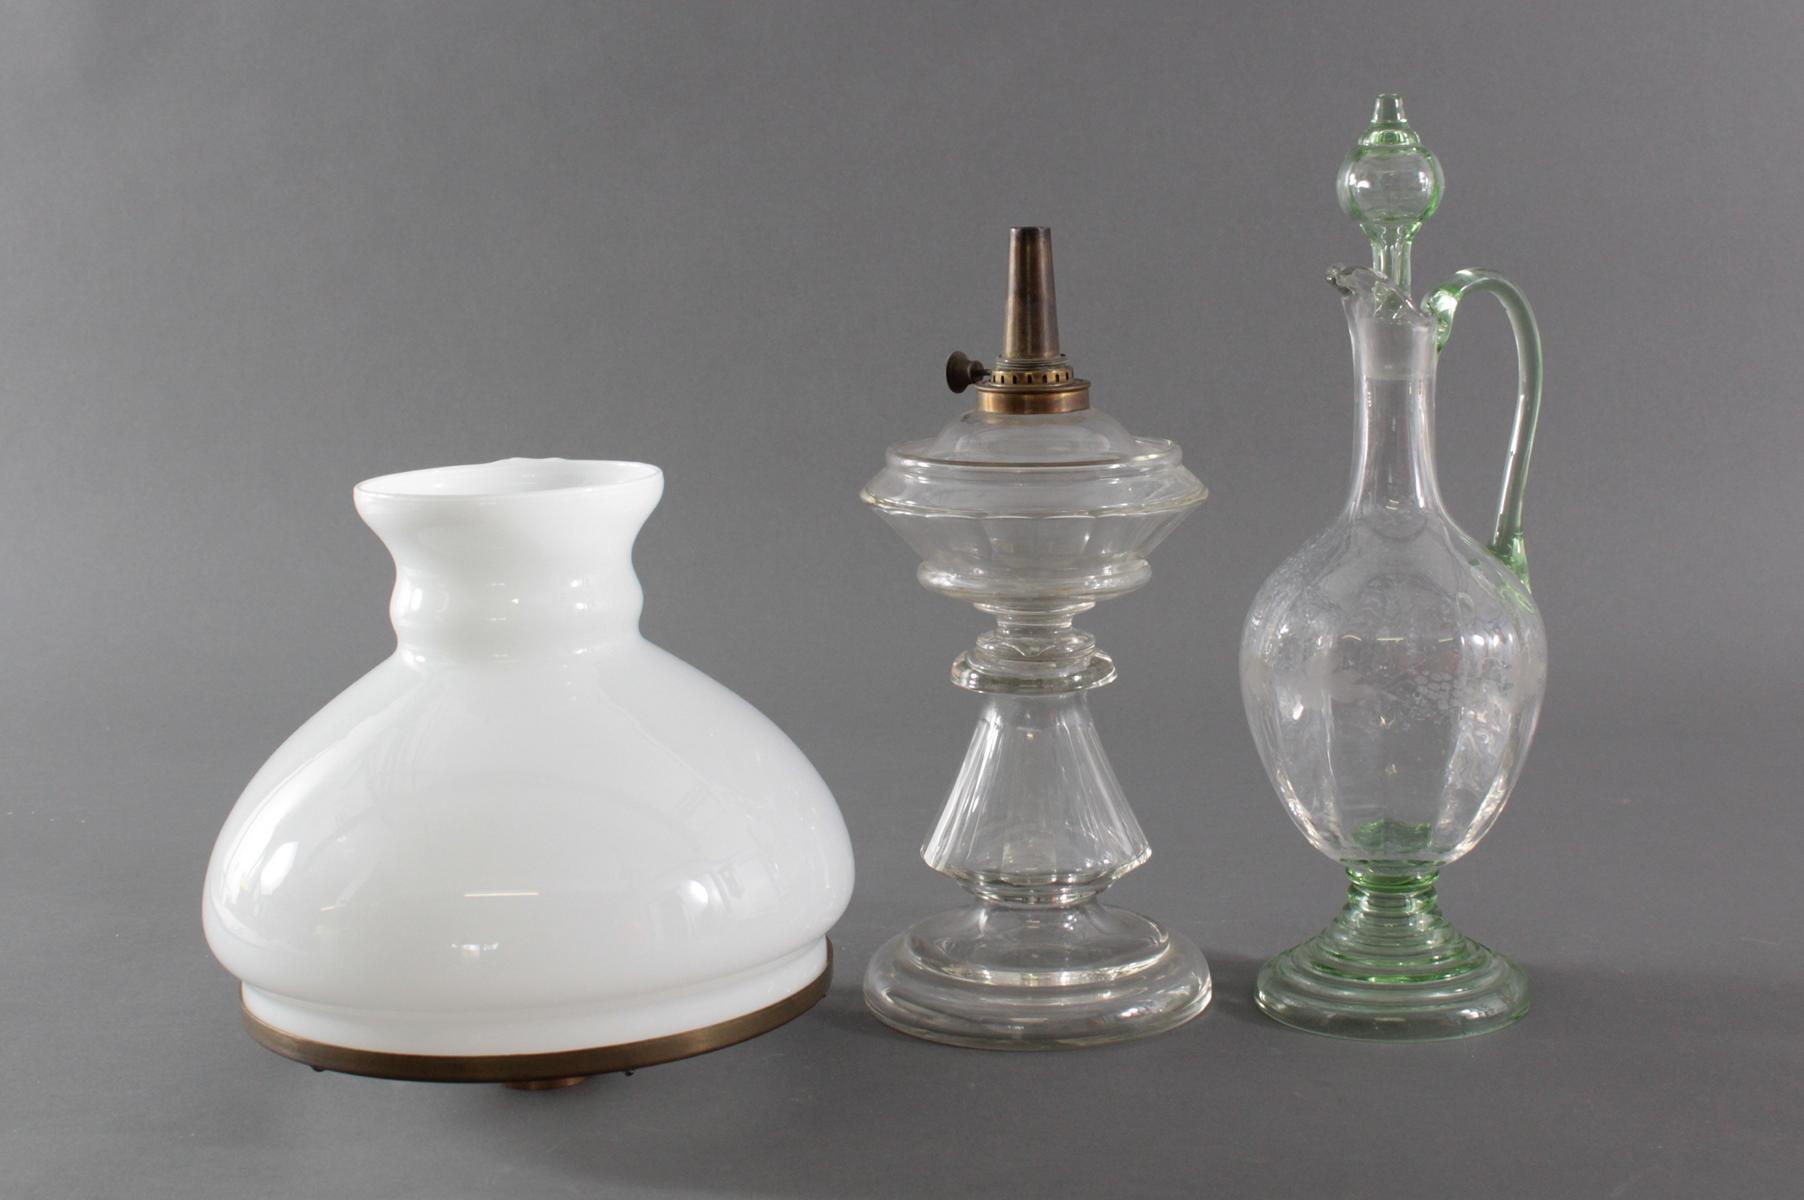 Petroleum Lampe und Glas-Karaffe um 1900-2